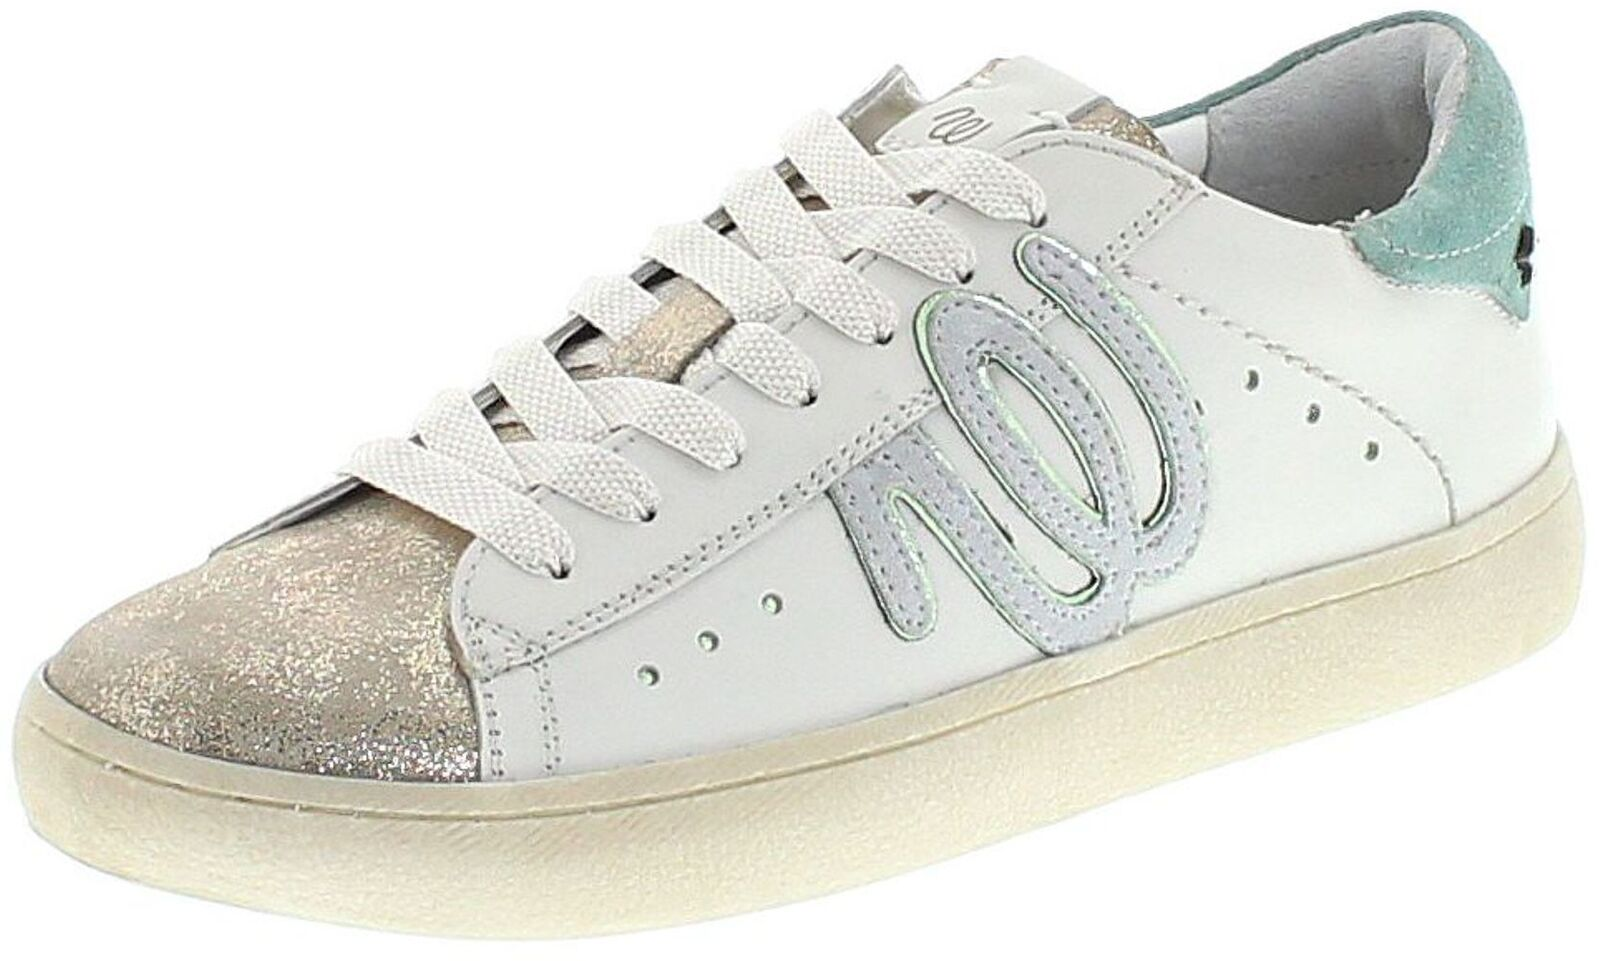 Wrangler wl181532 Clever WRG argent vert chaussures en Cuir Pour femmes blanc vert